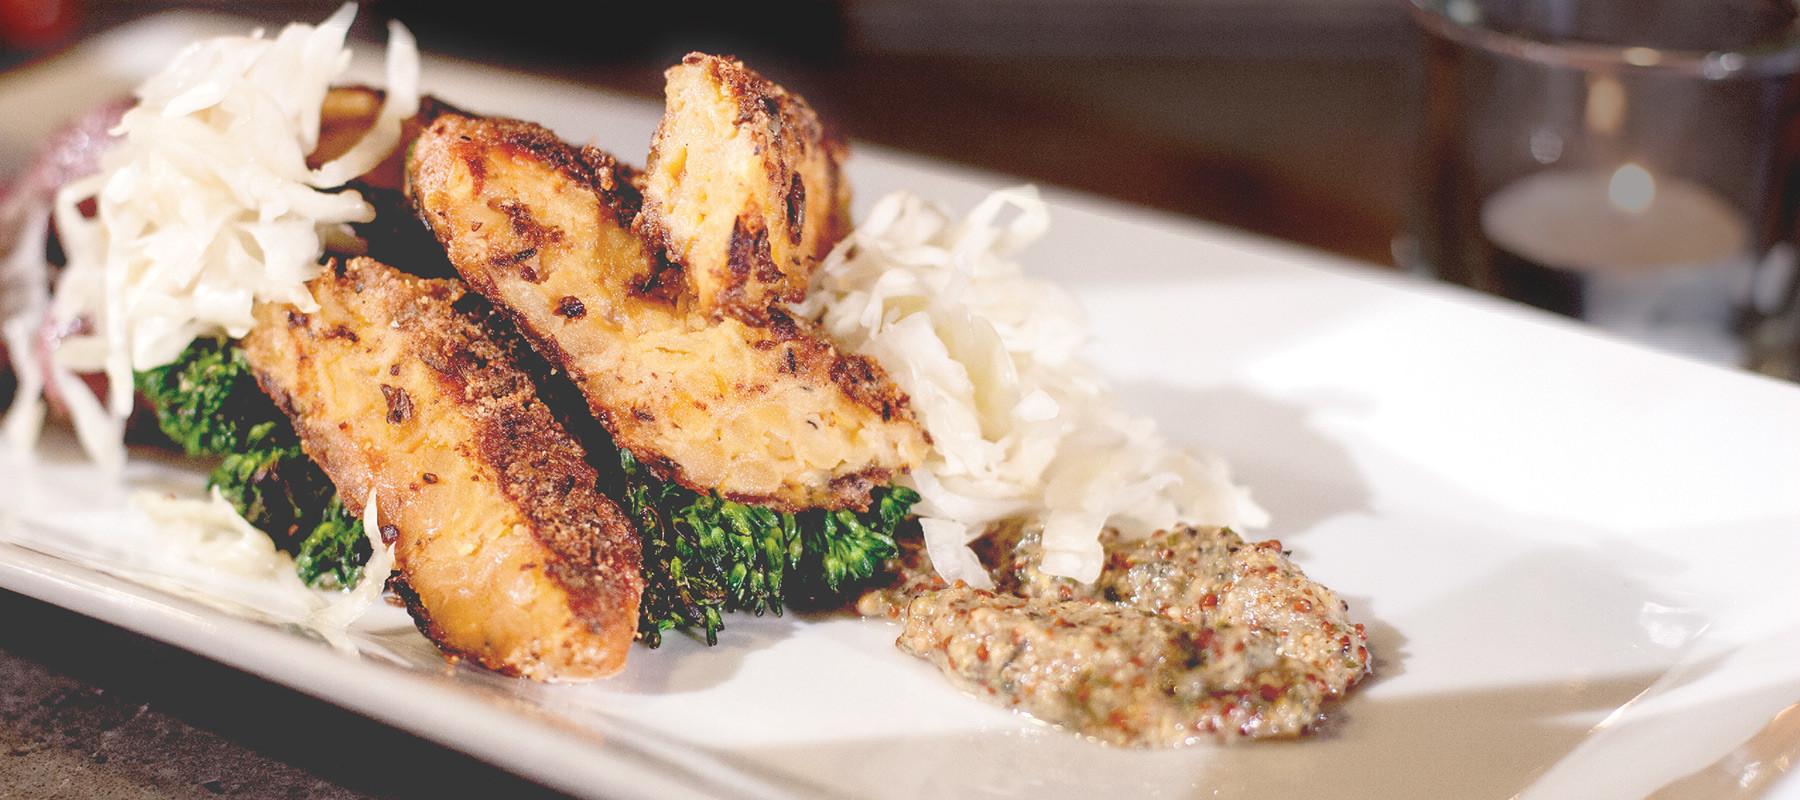 A healthy tempeh dish at a restaurant